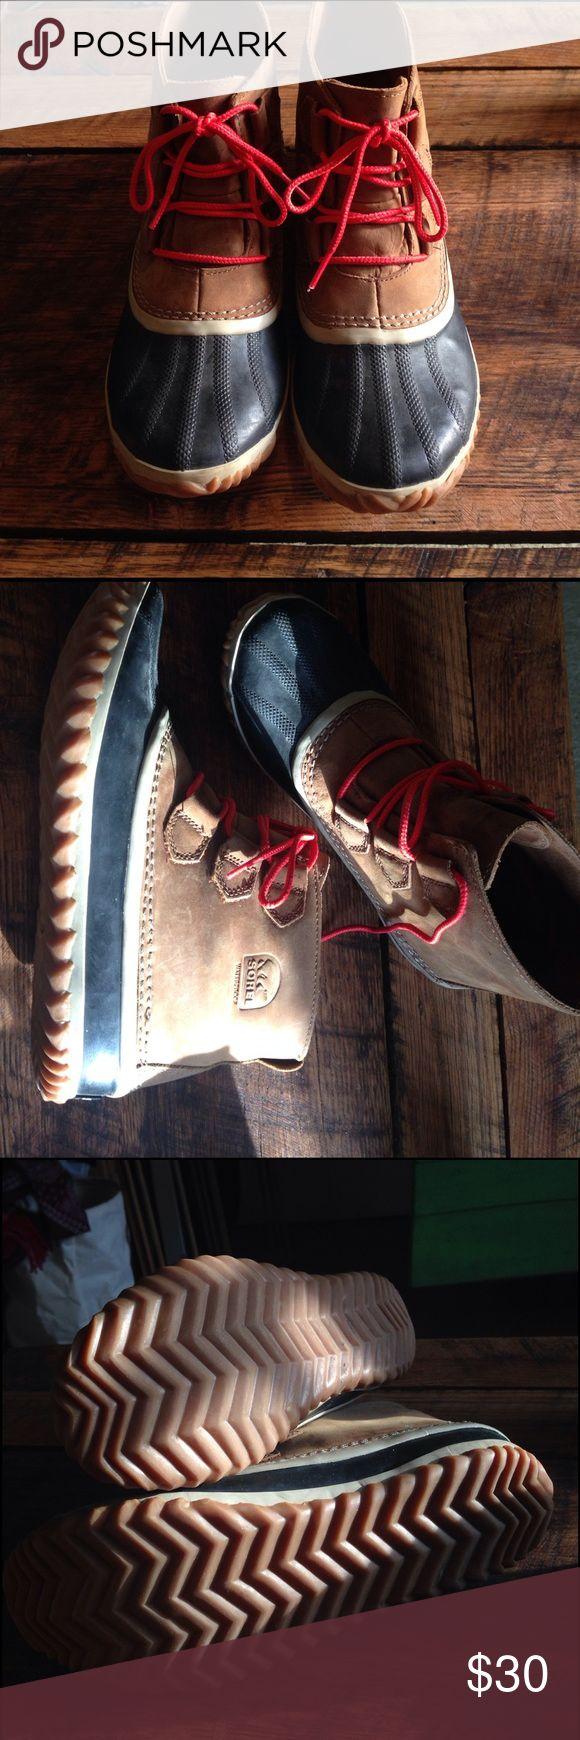 Sorel Out n' About Rain Boot Size 8 Women's Sorel rain boot. Size 8. Waterproof. Duck boot. Great tread. Worn less than 10 times. Sorel Shoes Winter & Rain Boots